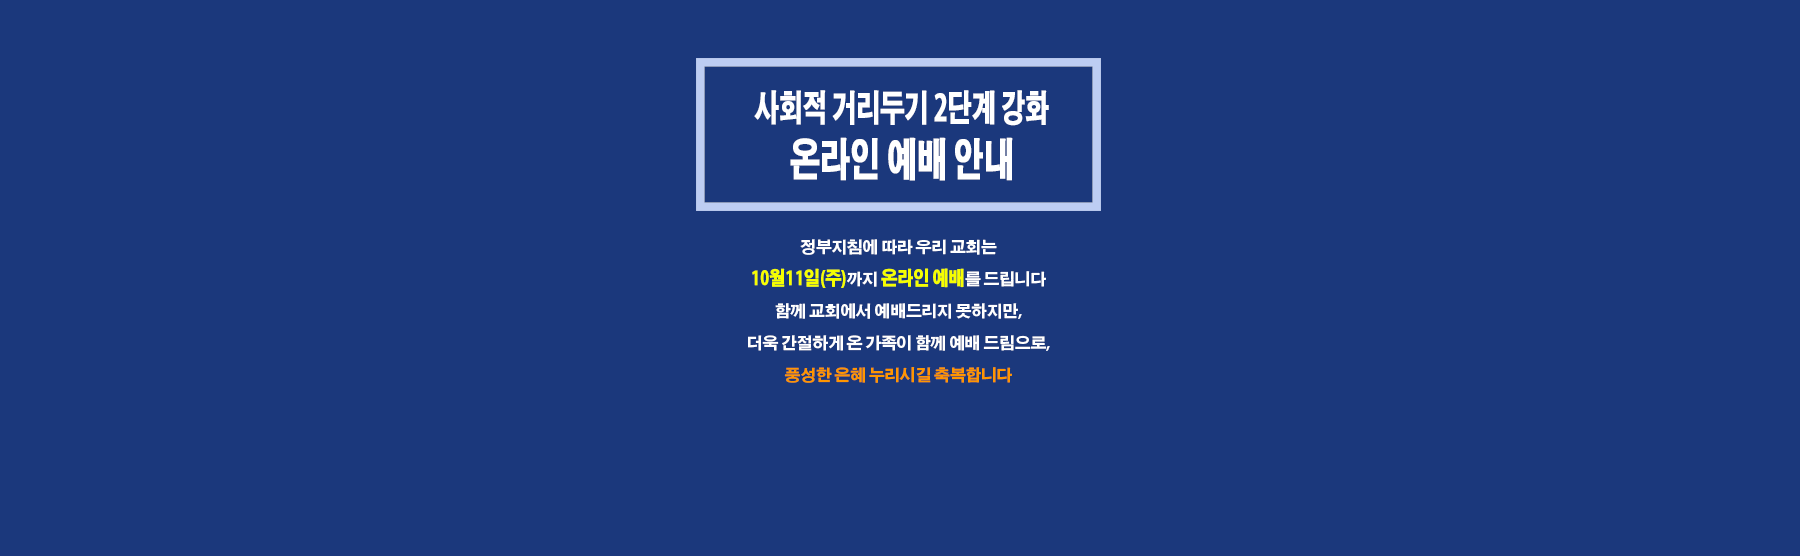 ban_sl-사회적거리두기2단계-200926png